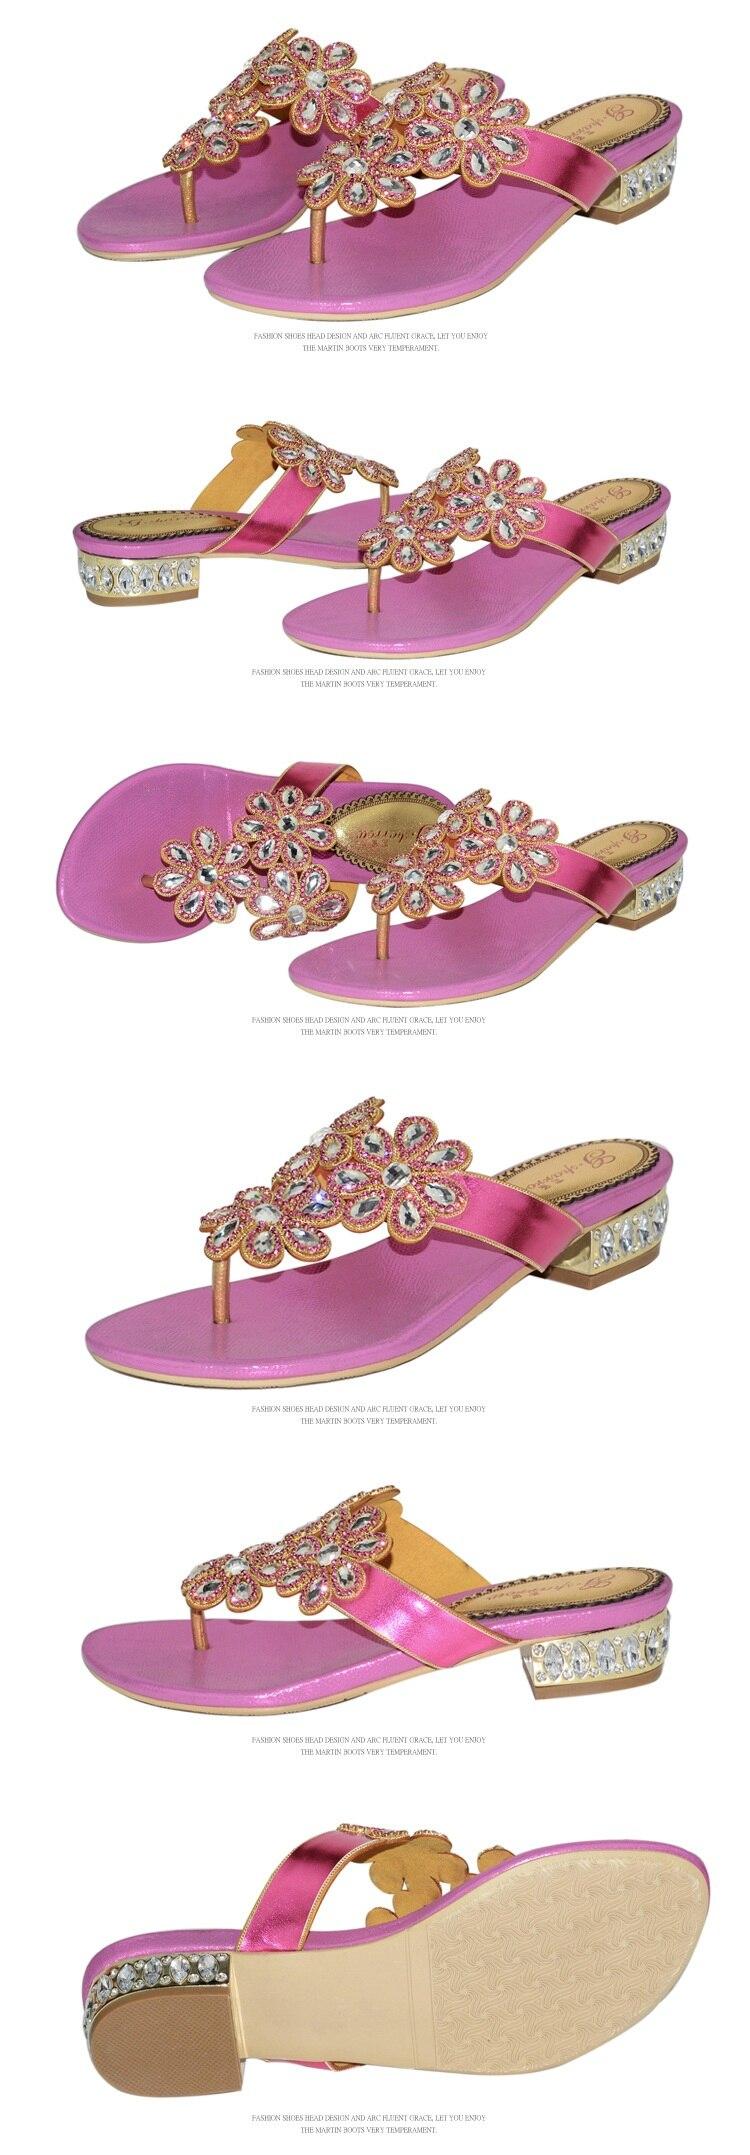 G-sparrow 2018 New Womens Fashion Rhinestones Slippers Flat Heels Flip Flops Gold Pink Size 11 High Quality5